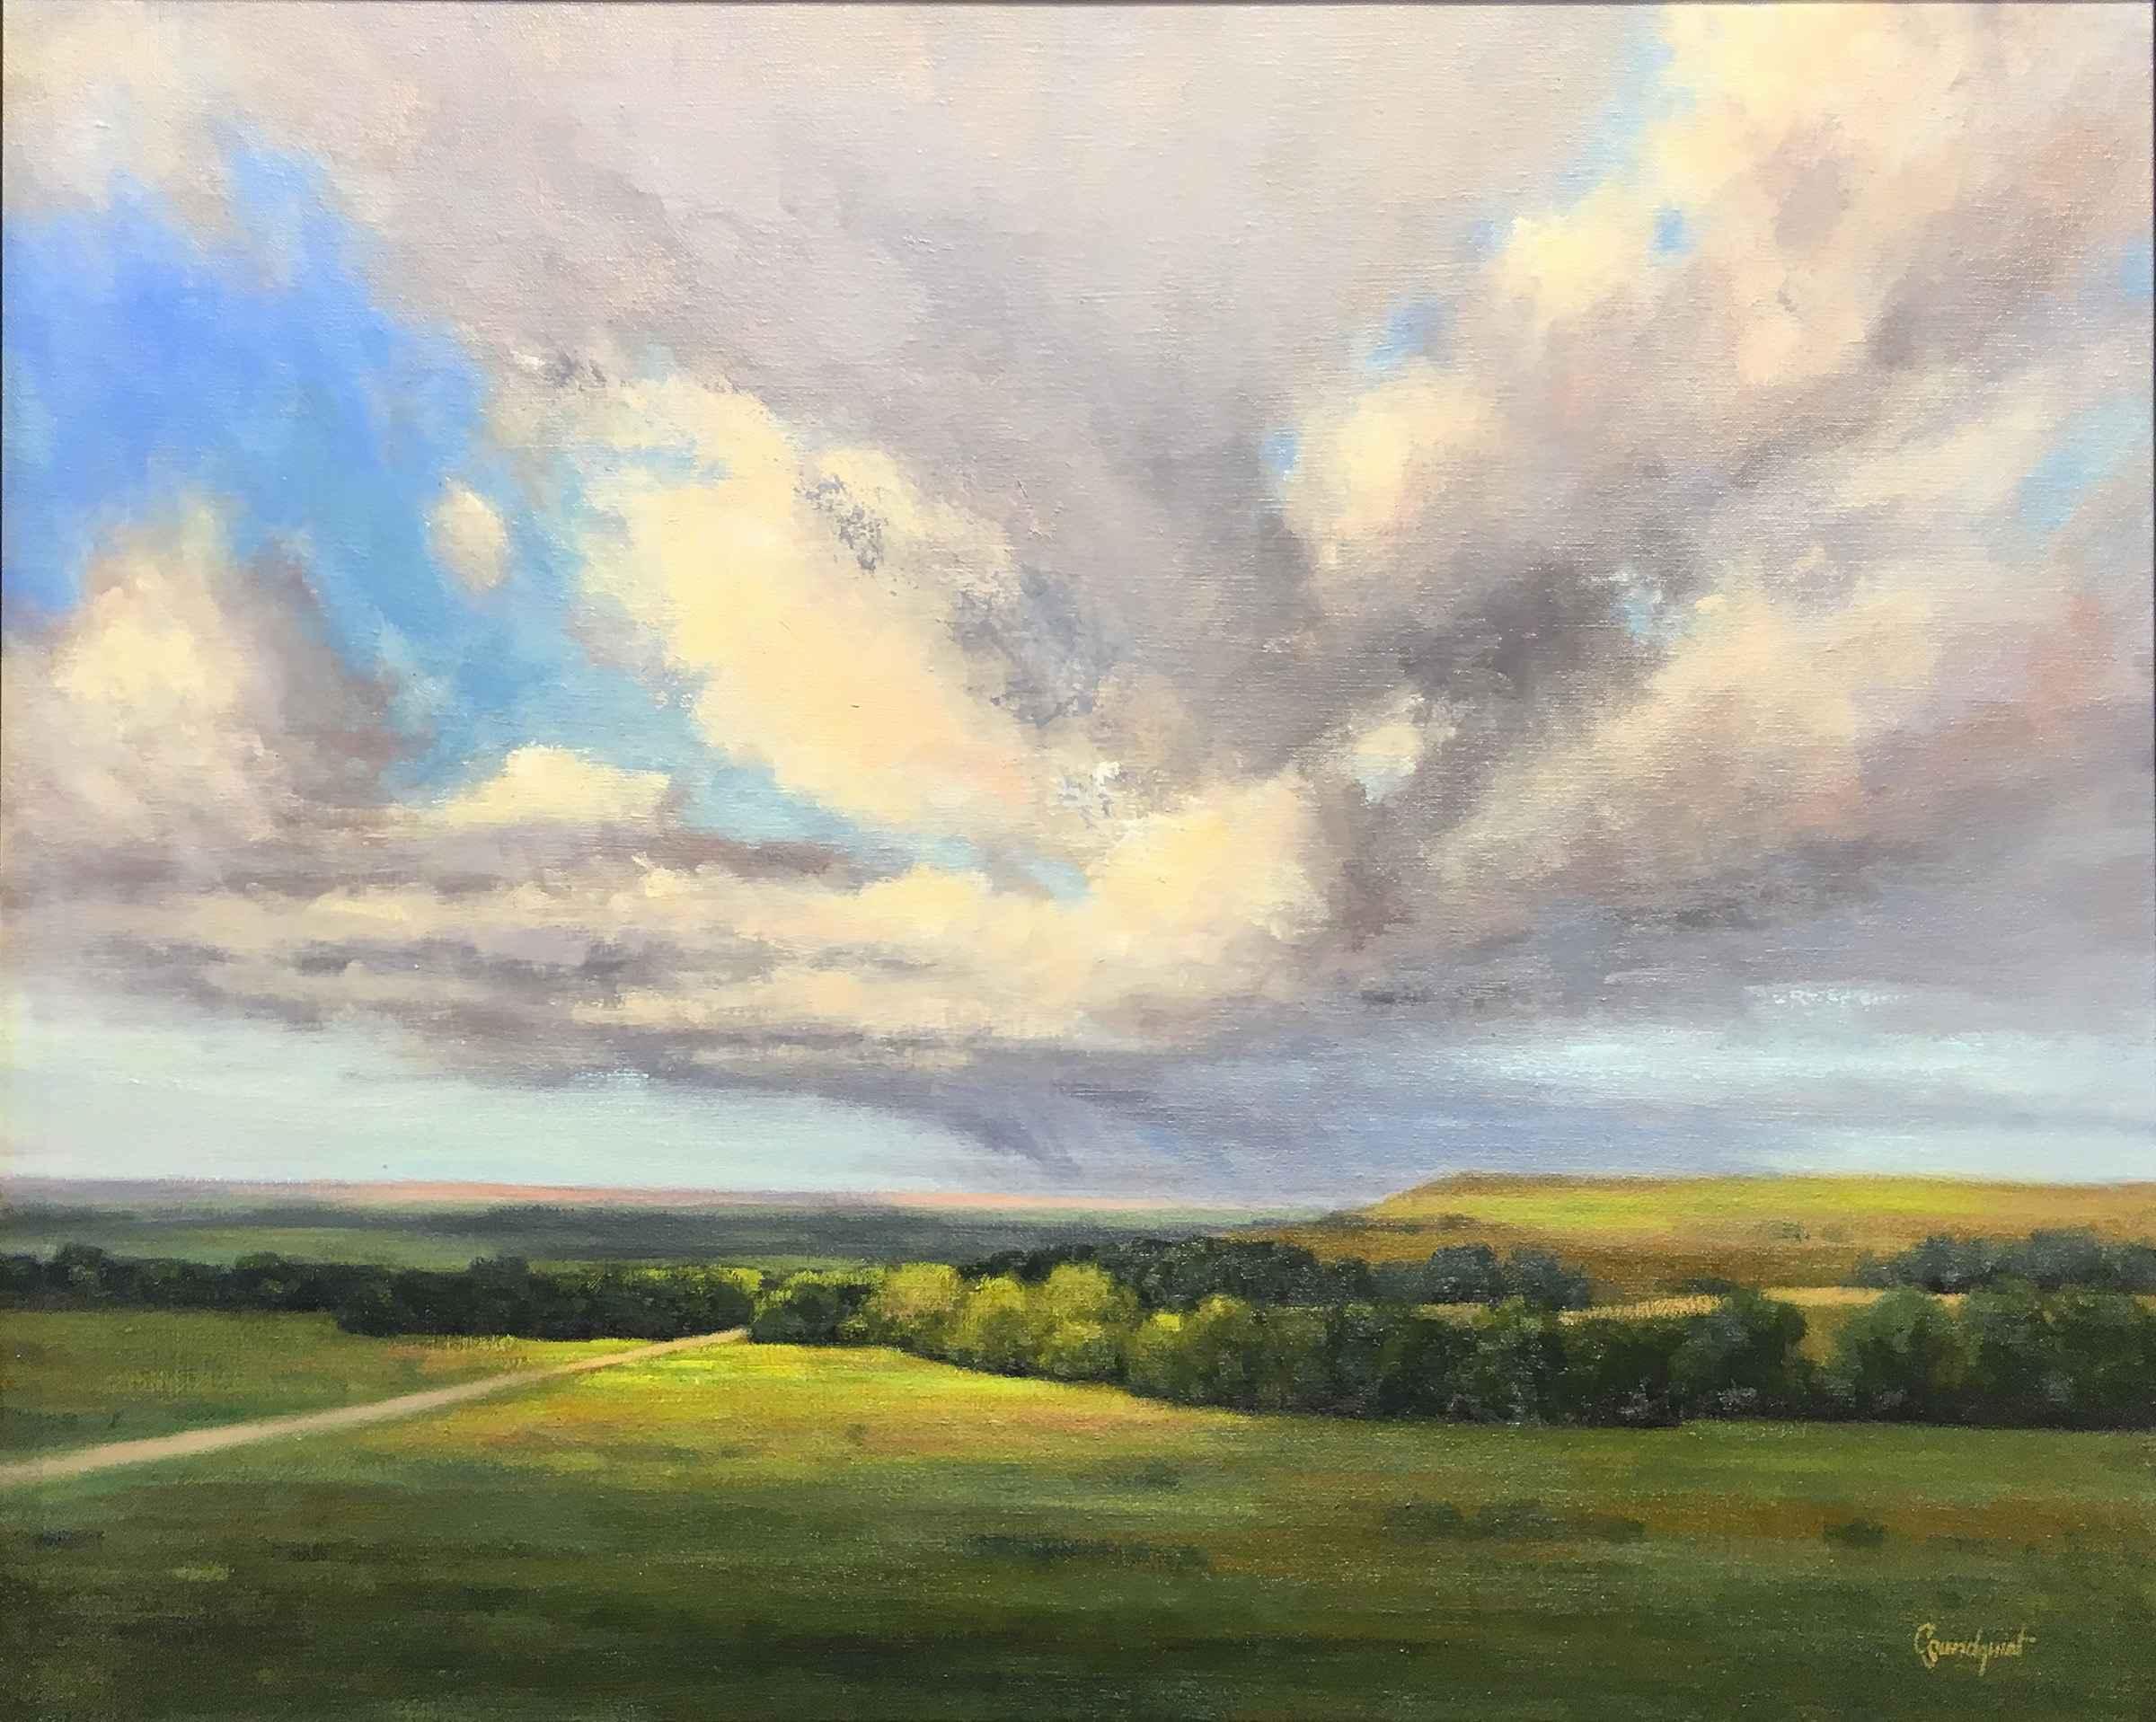 Rain and Spotlight by  Cristine Sundquist - Masterpiece Online